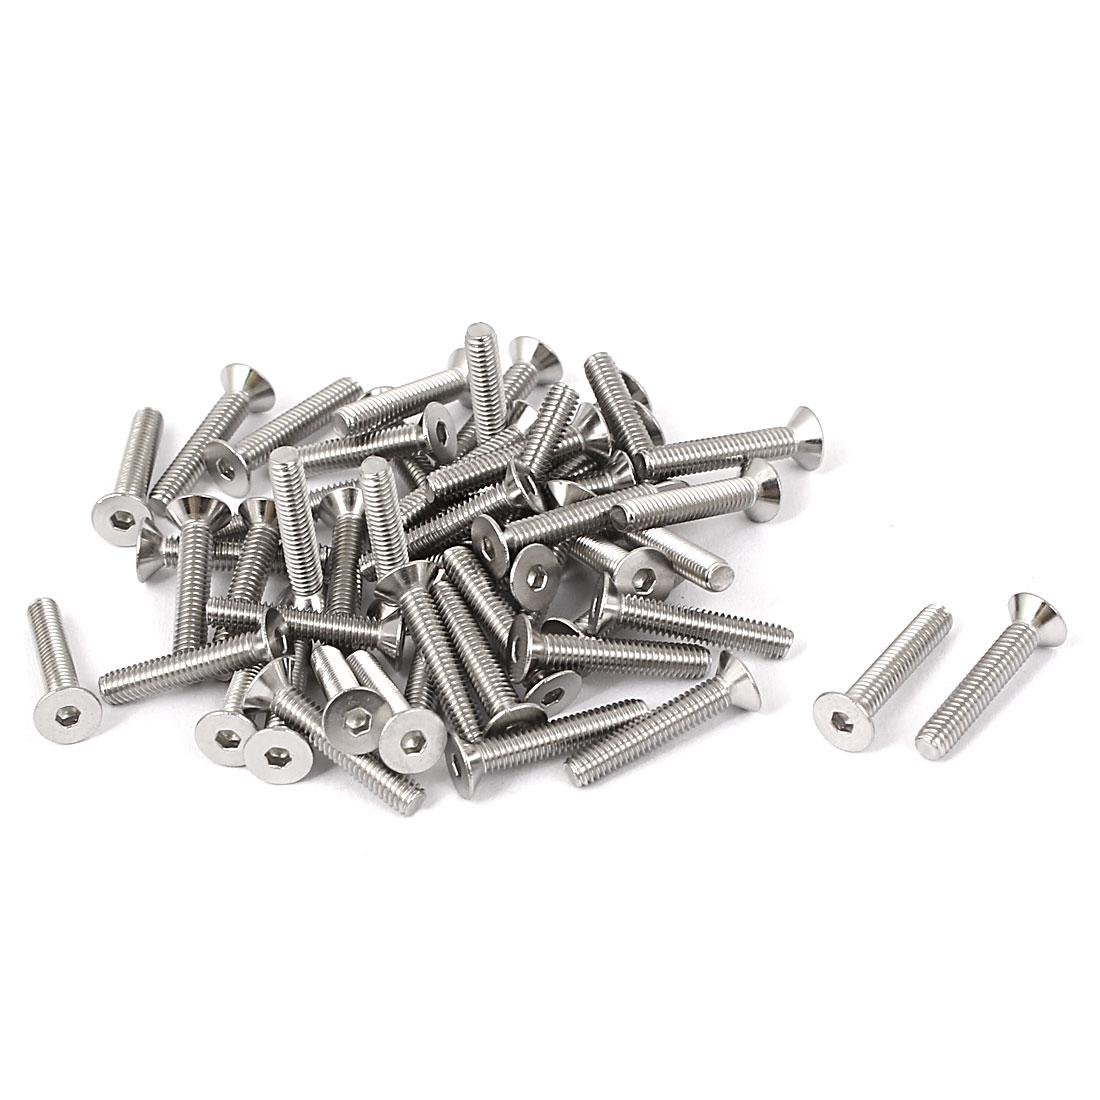 M2.5x14mm Stainless Steel Hex Socket Flat Head Countersunk Bolts Screw 50pcs